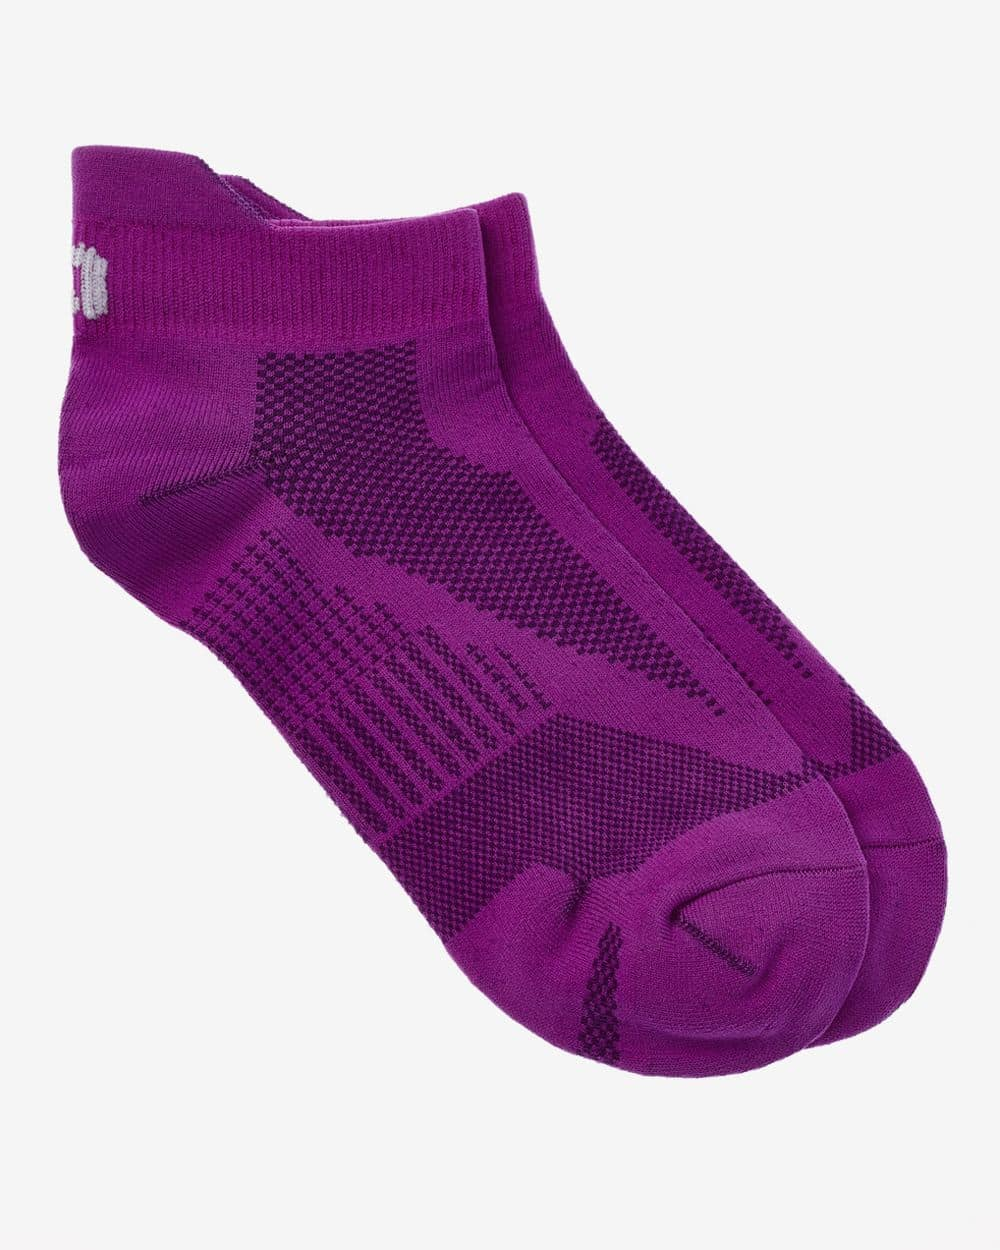 Socquettes de performance Hyba